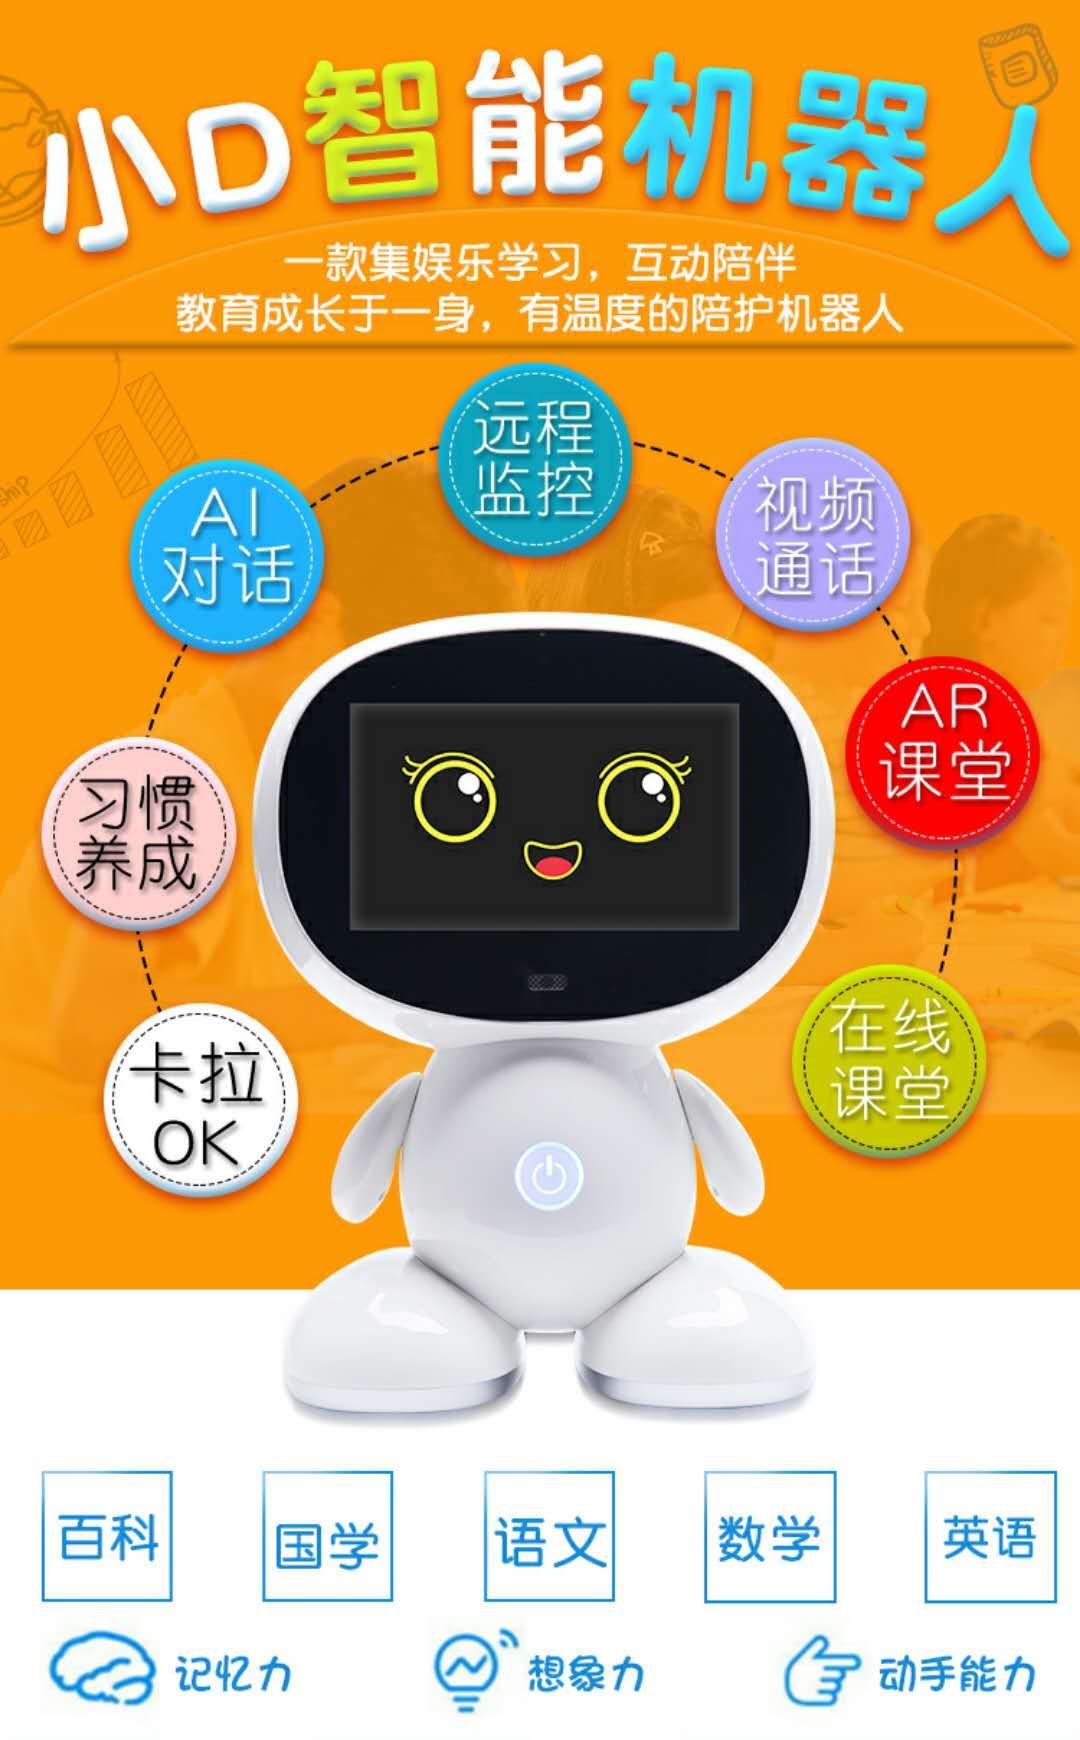 AR早教机器人学习机小D招代理